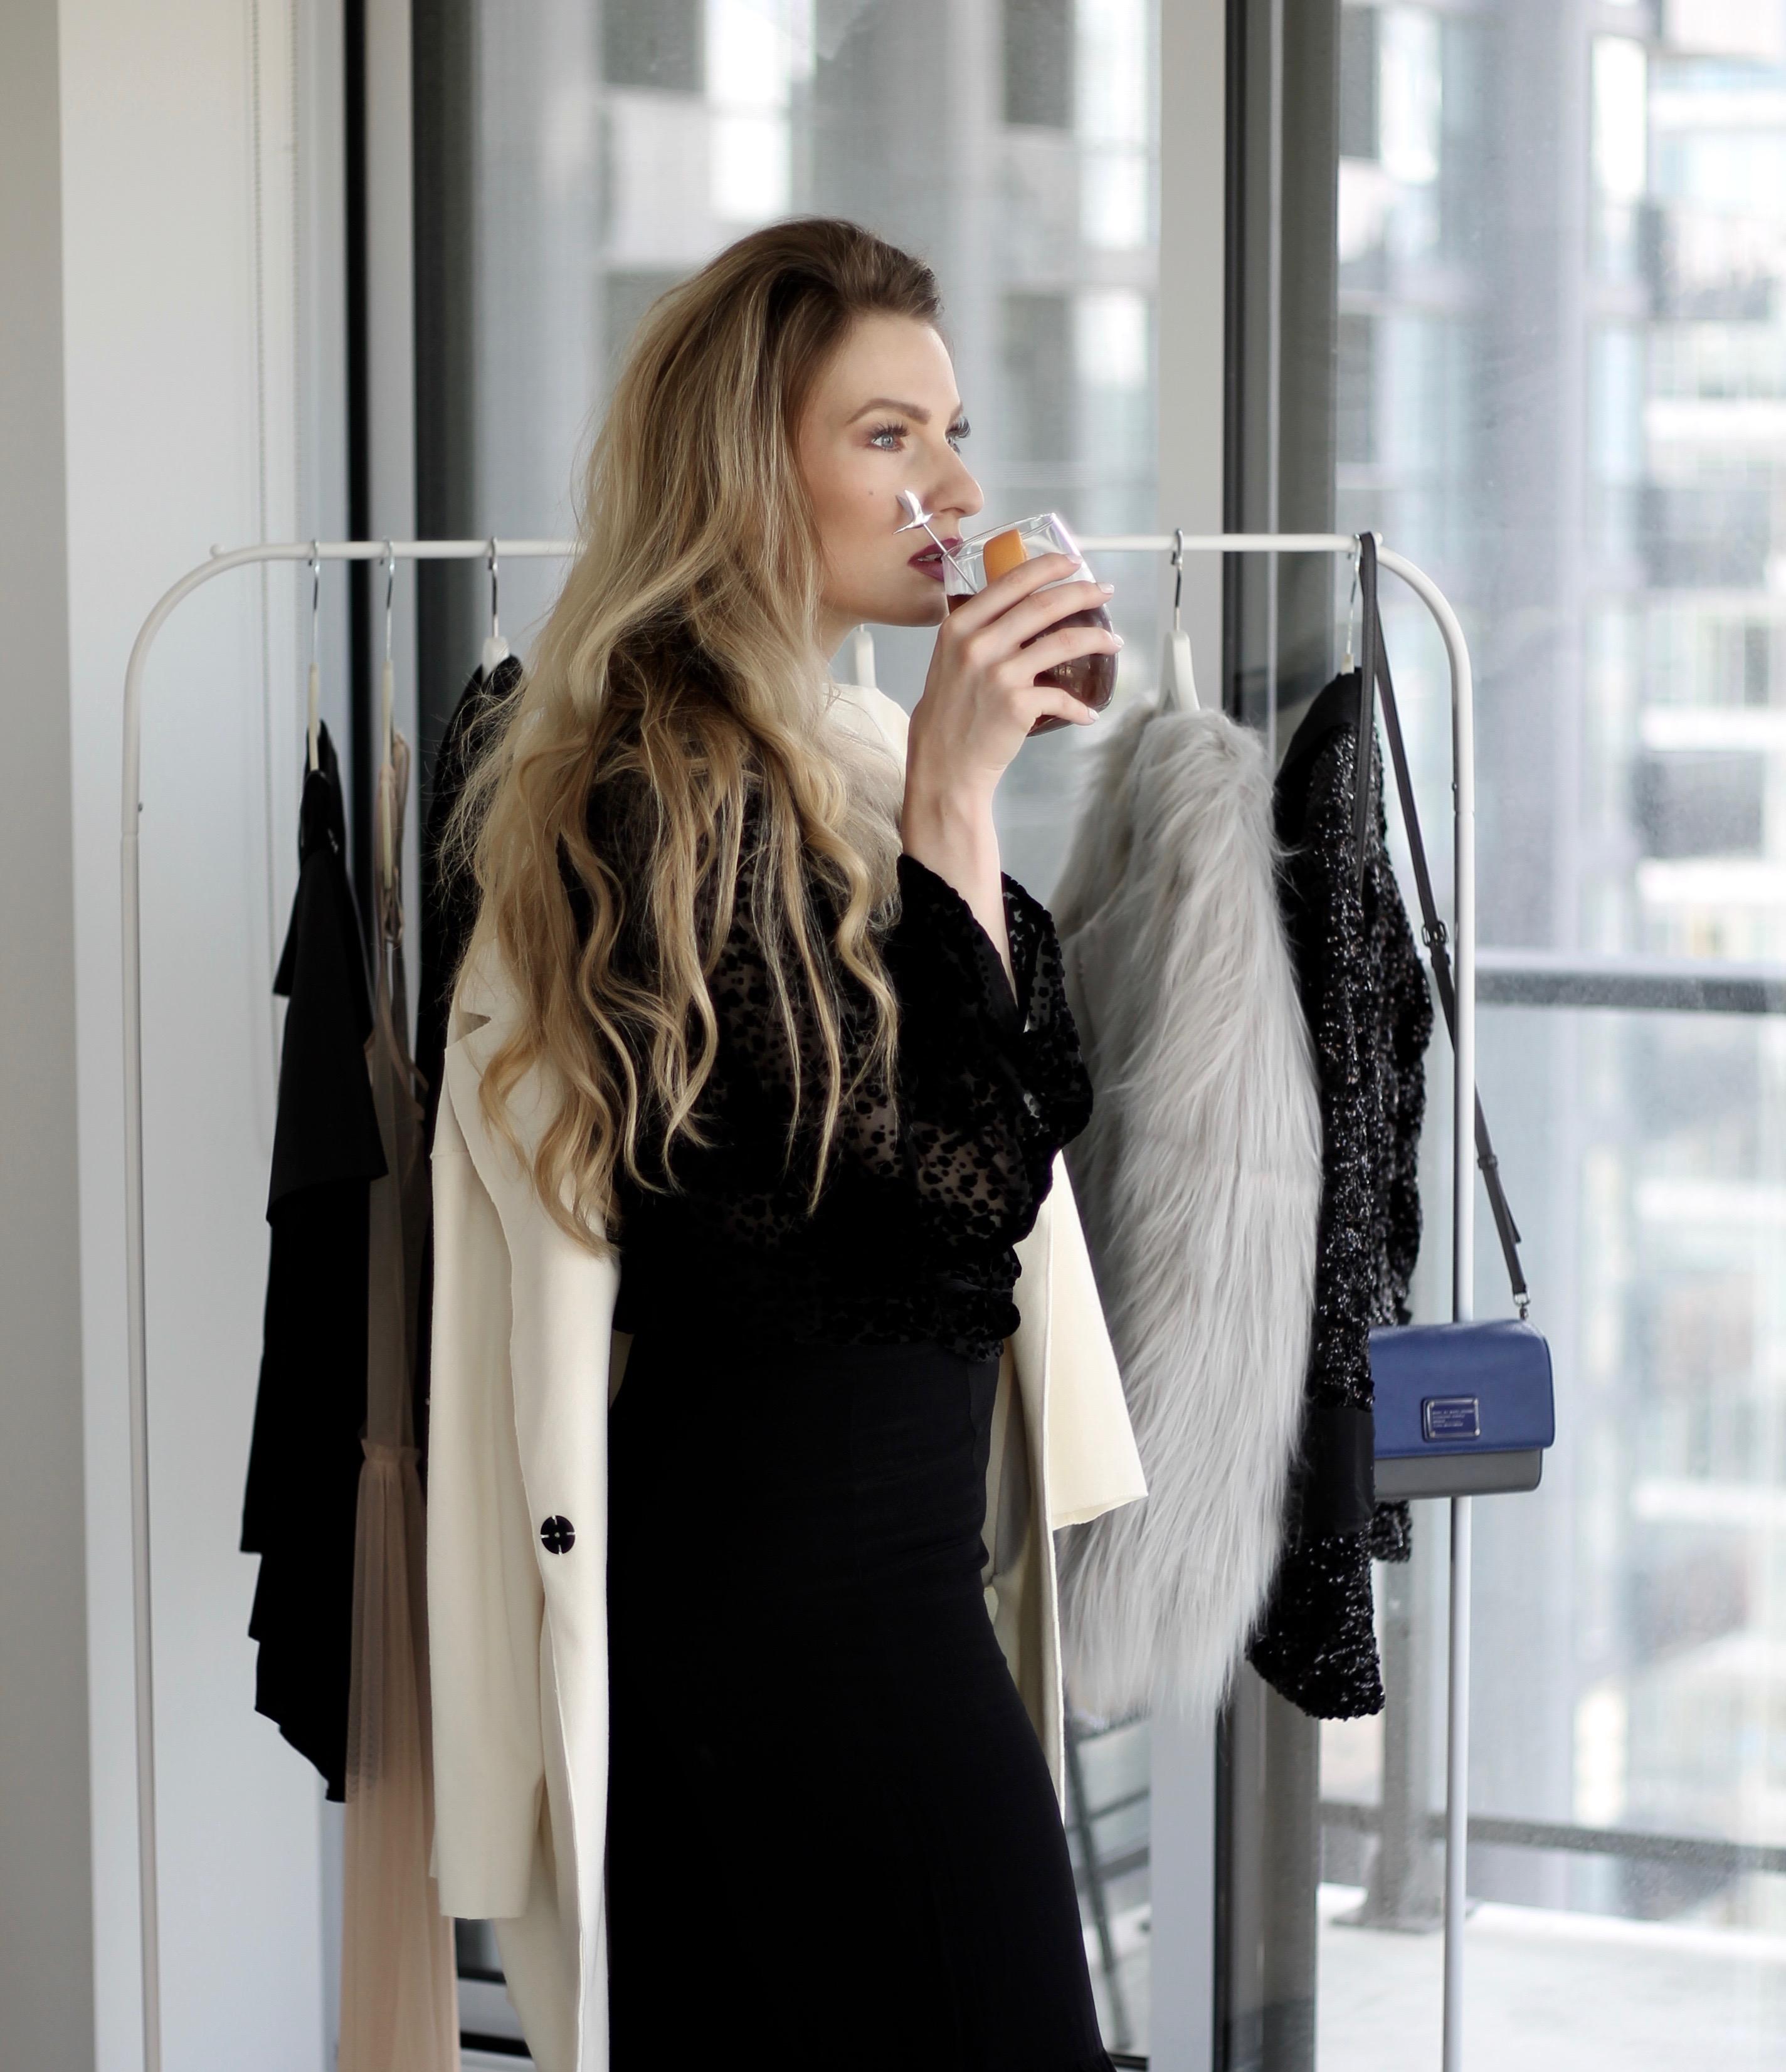 MON MODE Blog | Mon Mode | Style Blog | Toronto Blogger | Fashionbogger | Toronto Fashion Week